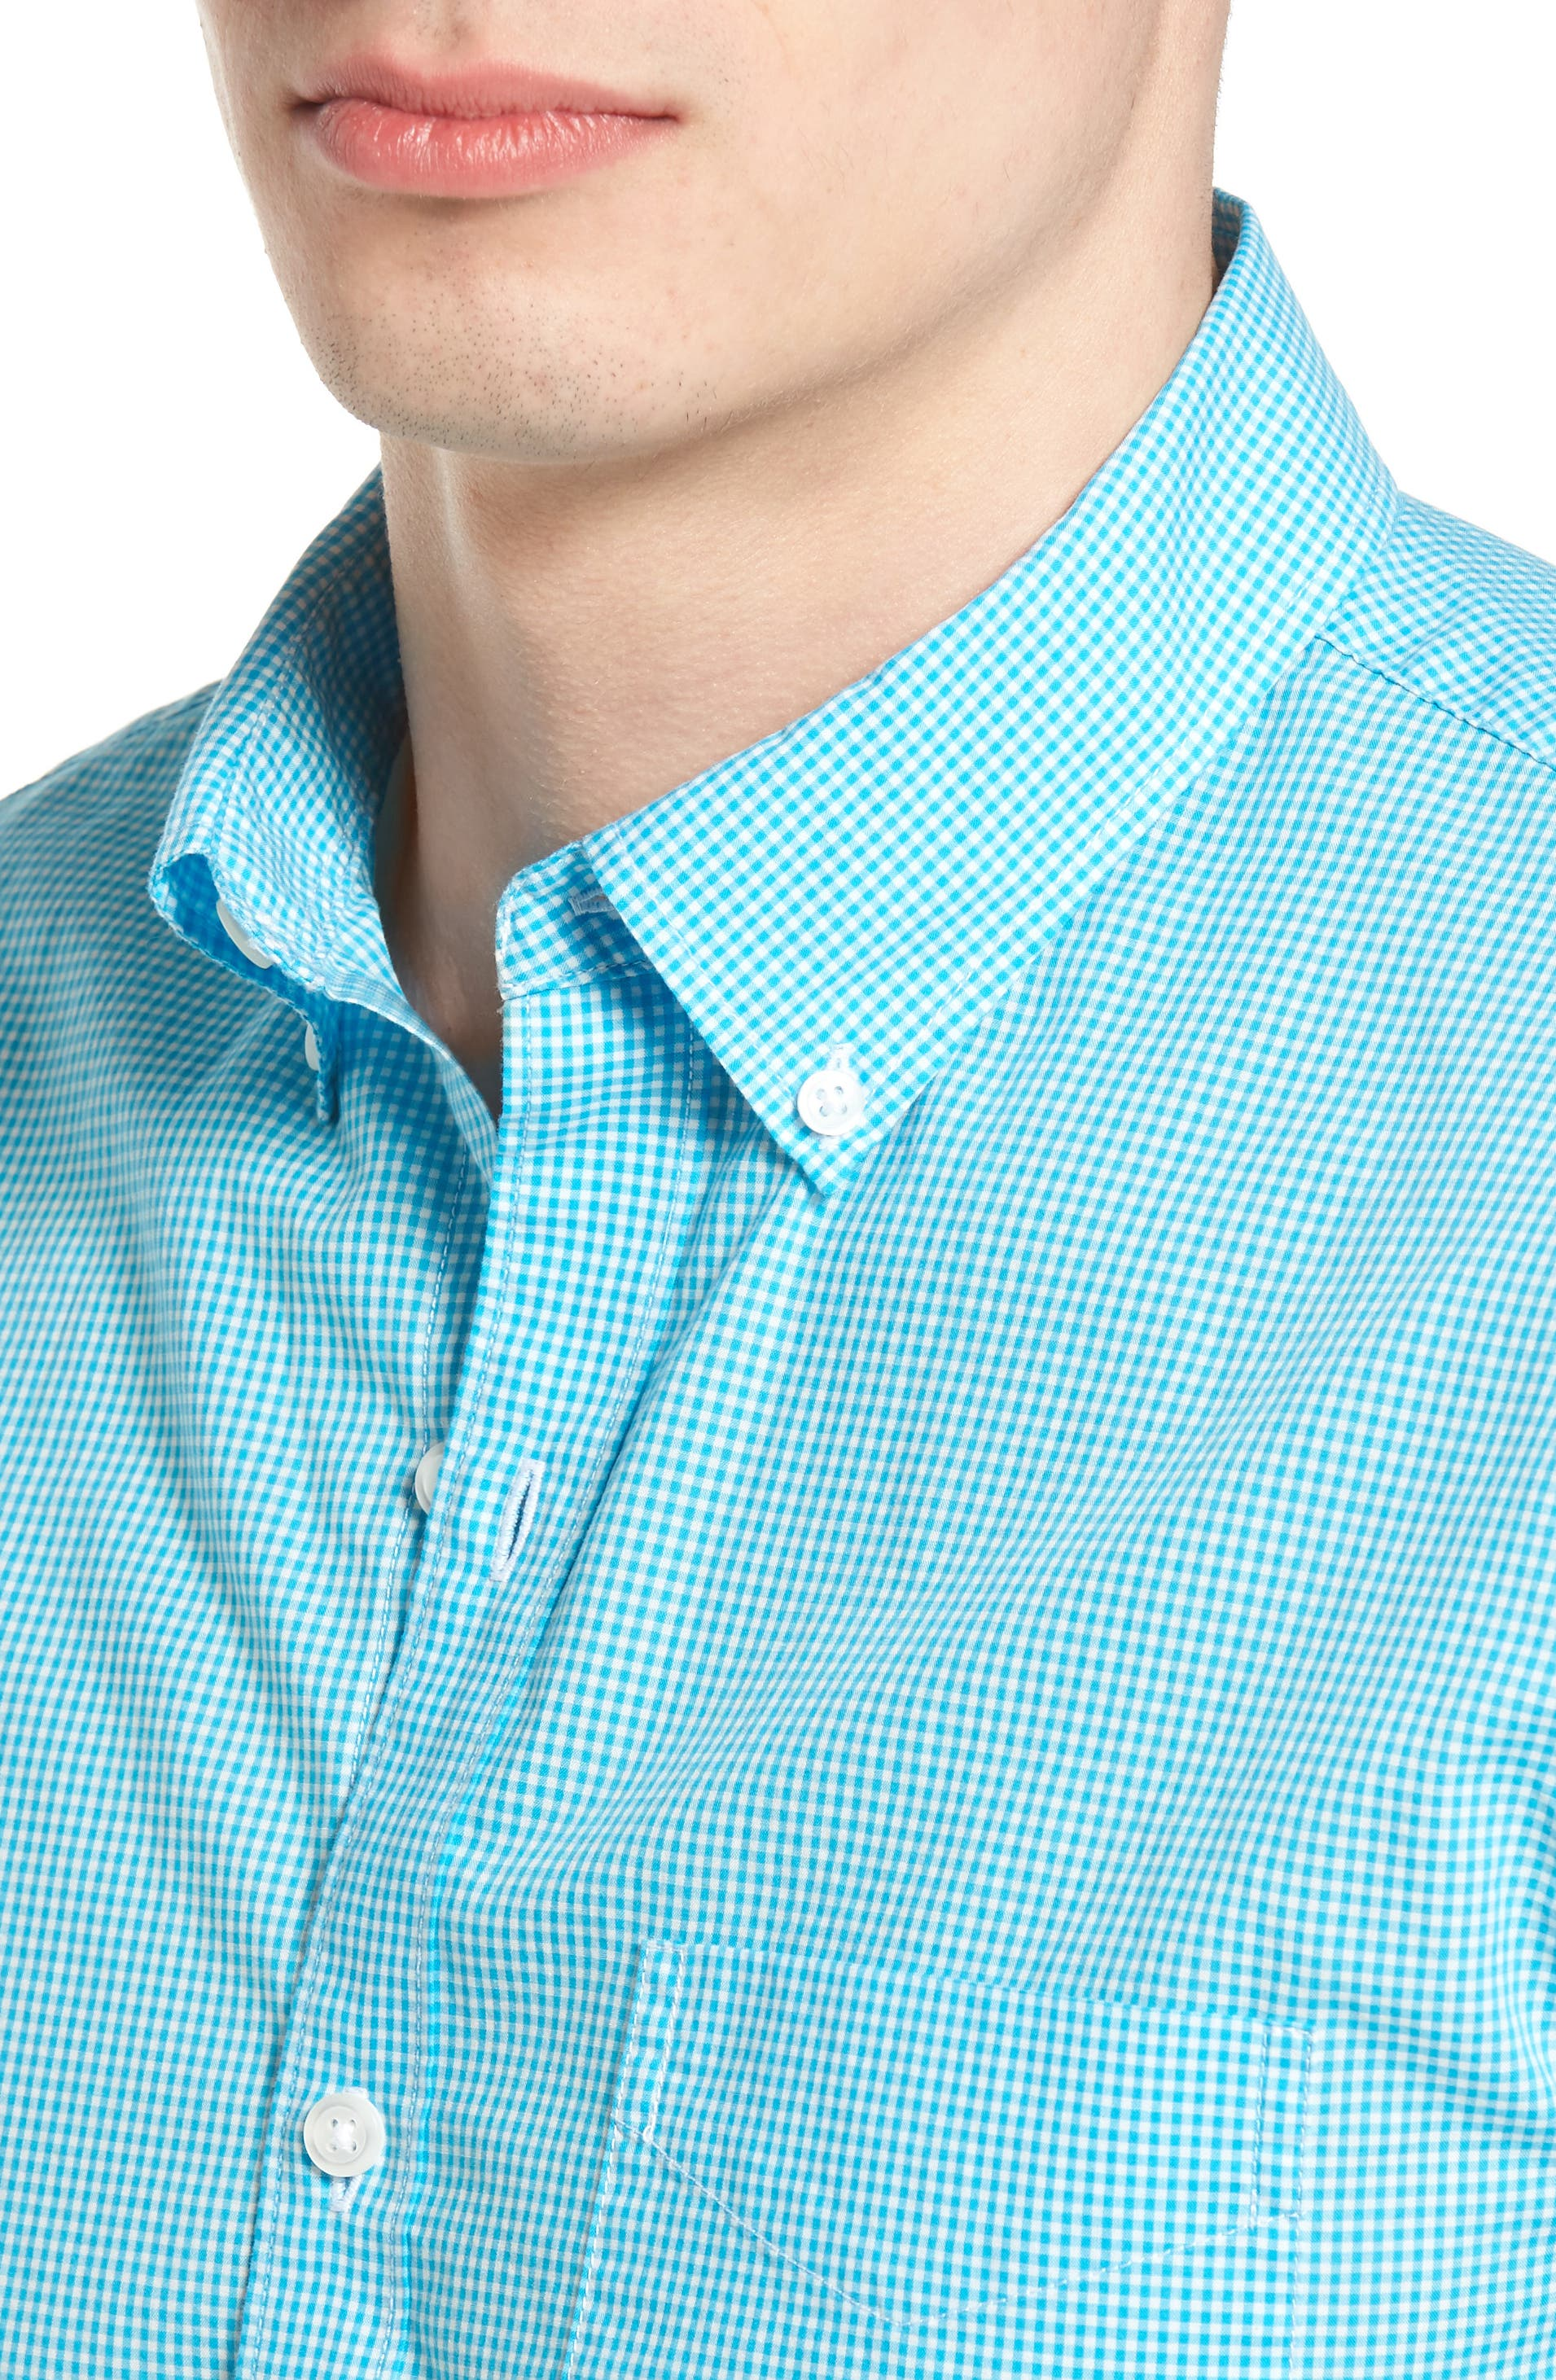 Summerweight Slim Fit Sport Shirt,                             Alternate thumbnail 4, color,                             Bonid Gingham Blue